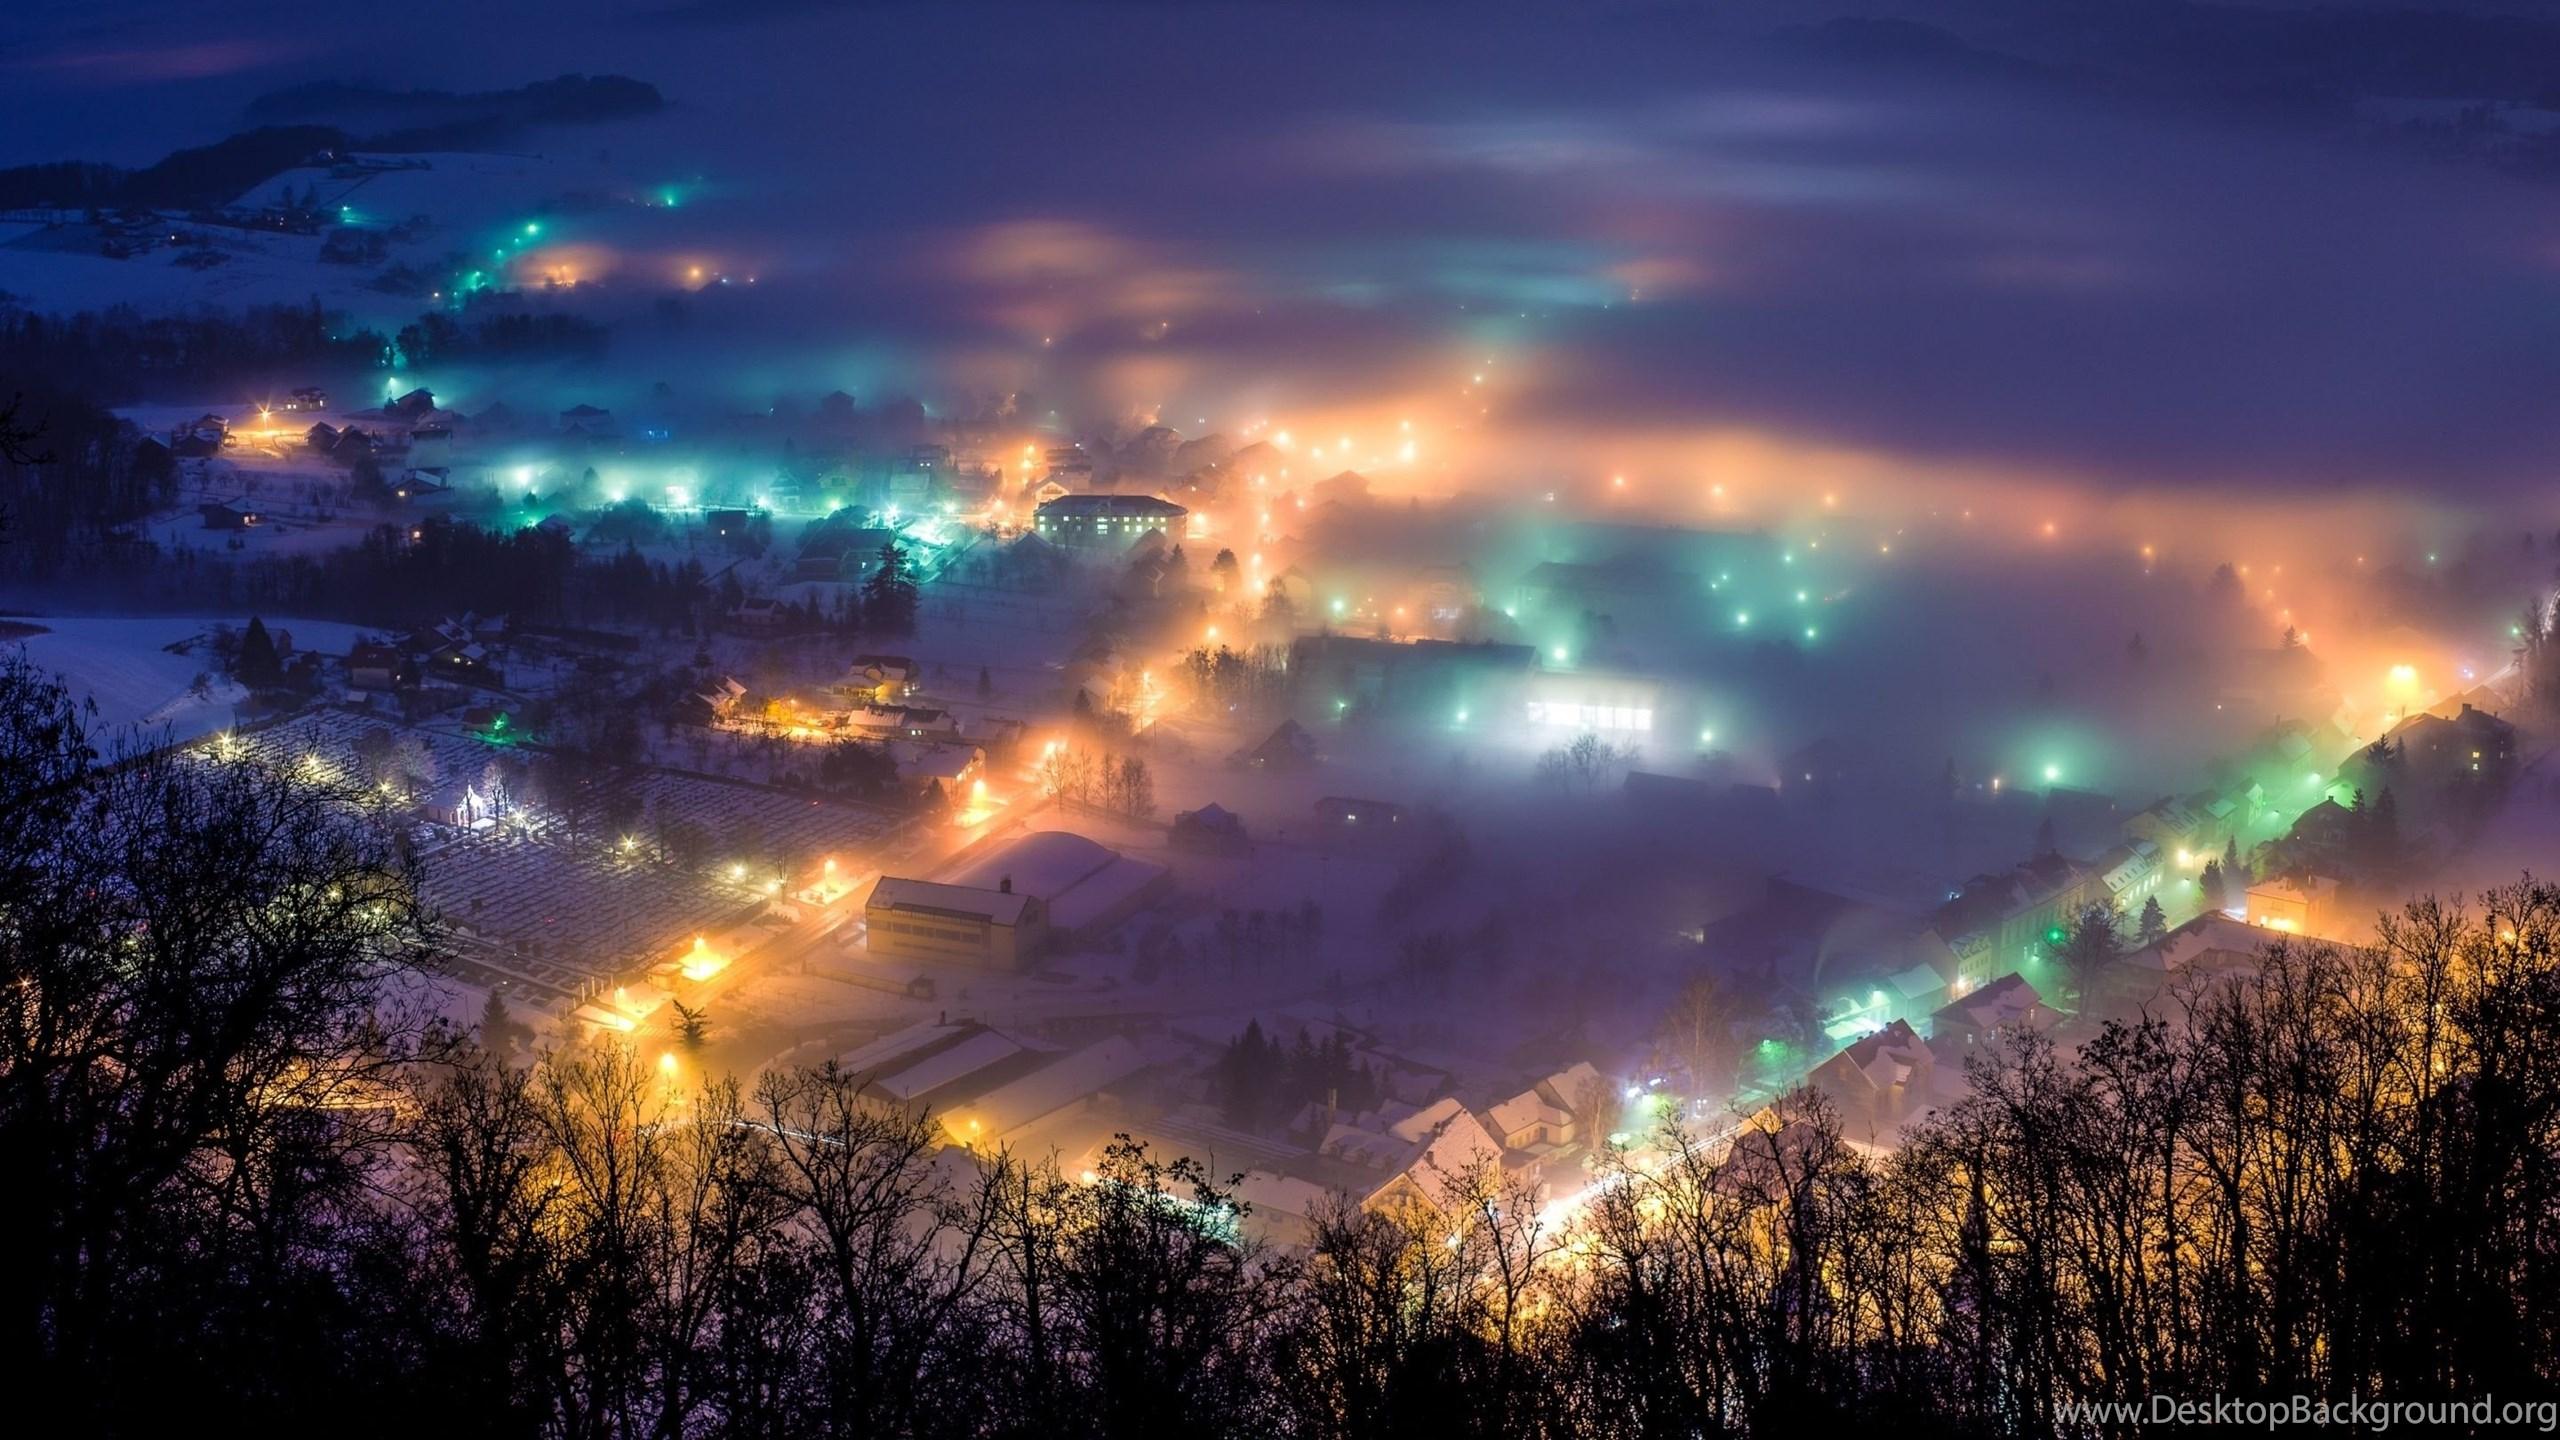 Most Inspiring Wallpaper Mac Winter - 234324_free-winter-mac-wallpapers-imac-wallpapers-retina-macbook-pro_2880x1800_h  Graphic_599054.jpg